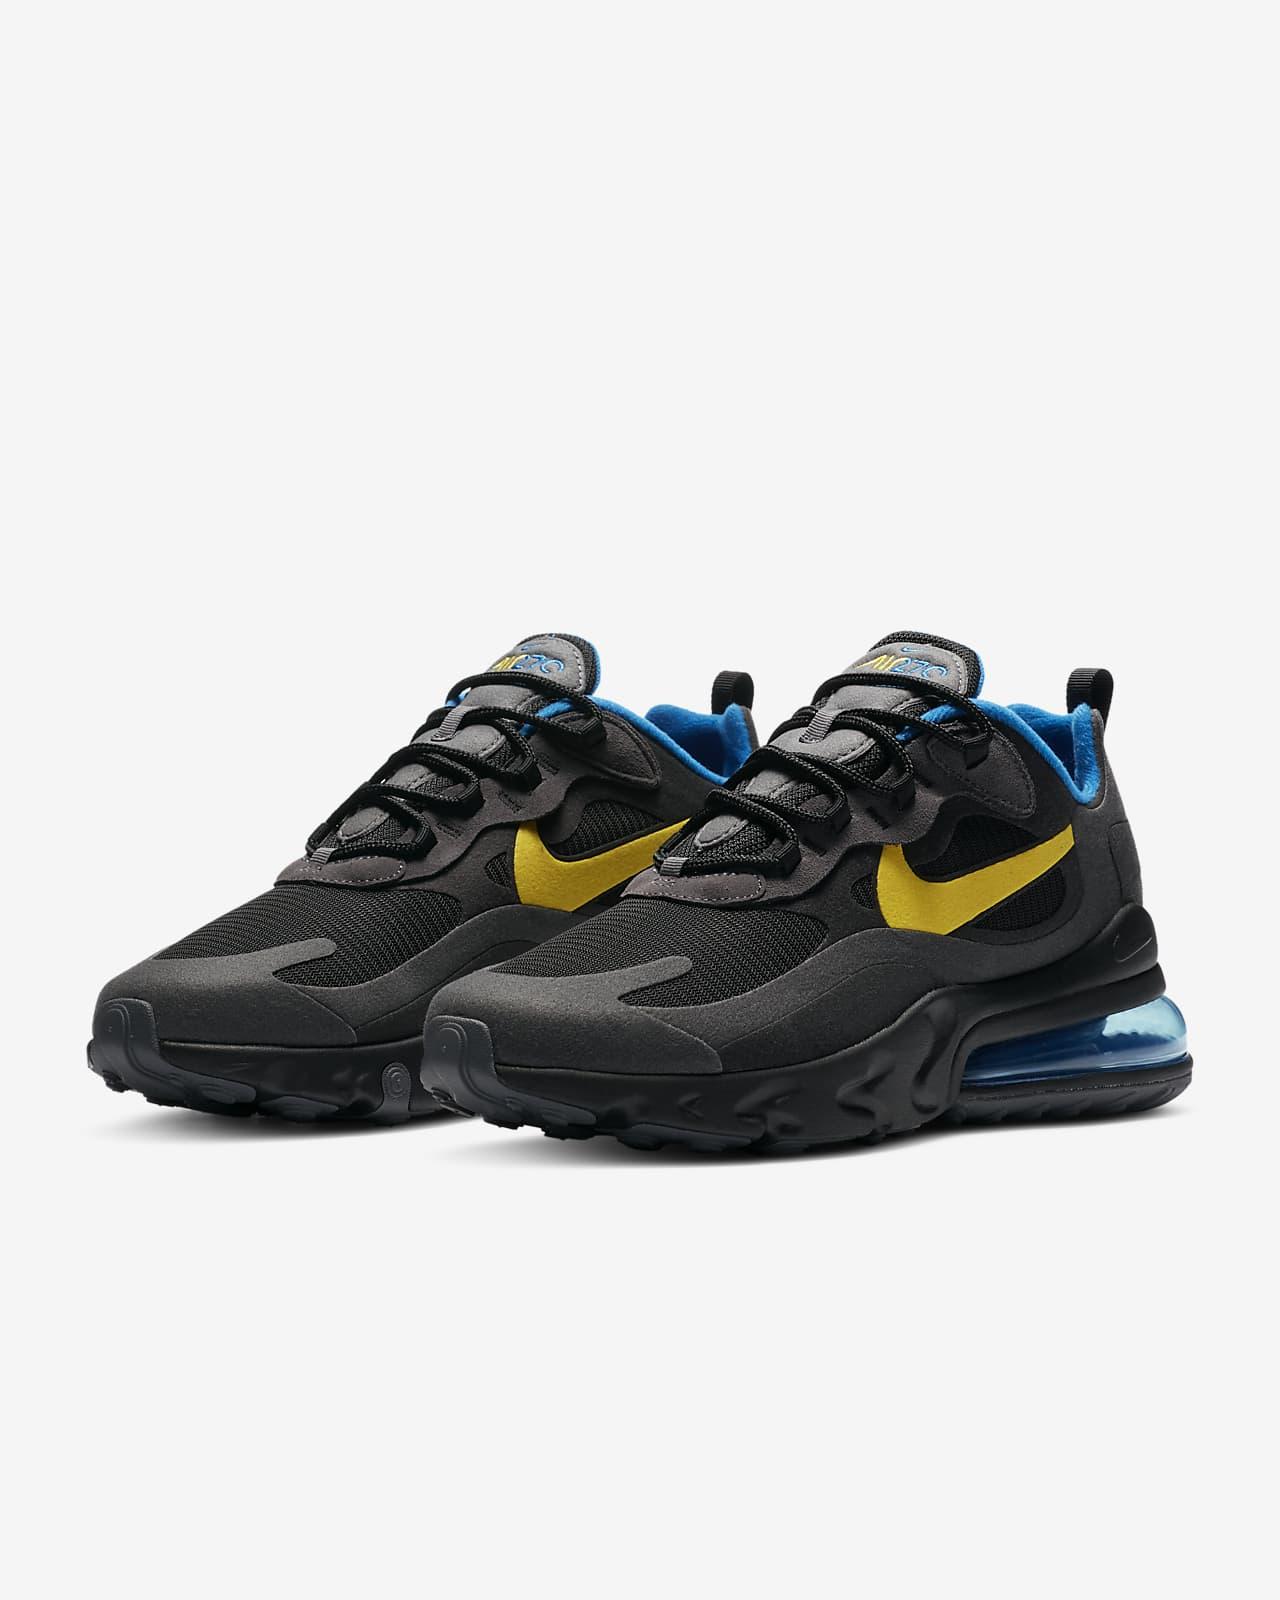 Chaussure Nike Air Max 270 React pour Homme. Nike LU